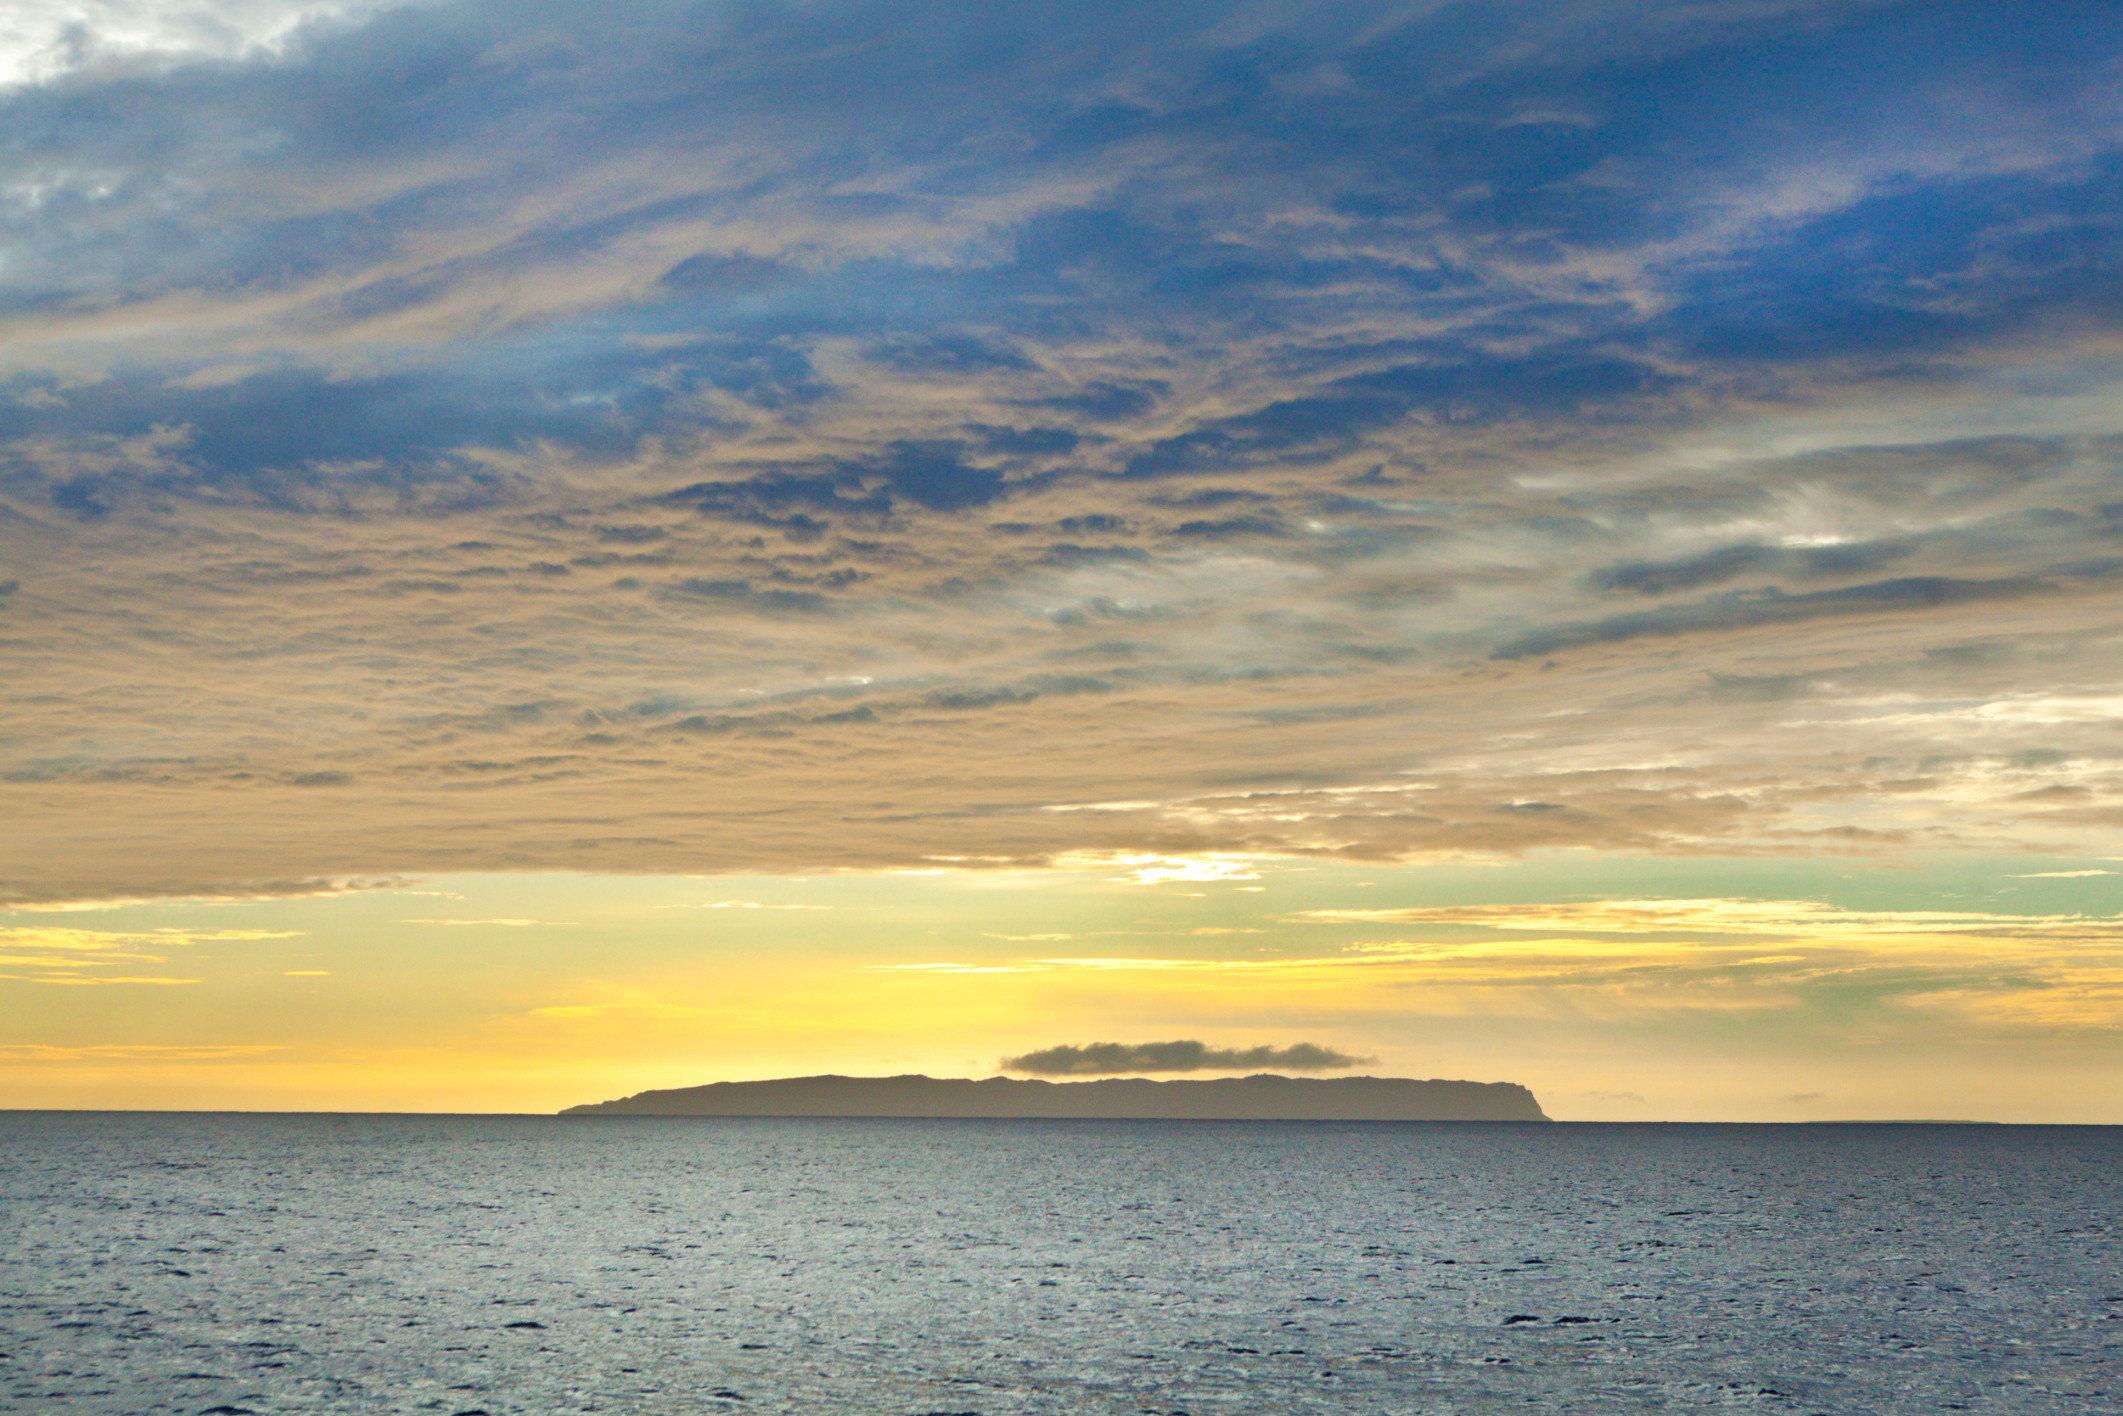 The island of Niihau as seen from Kauai